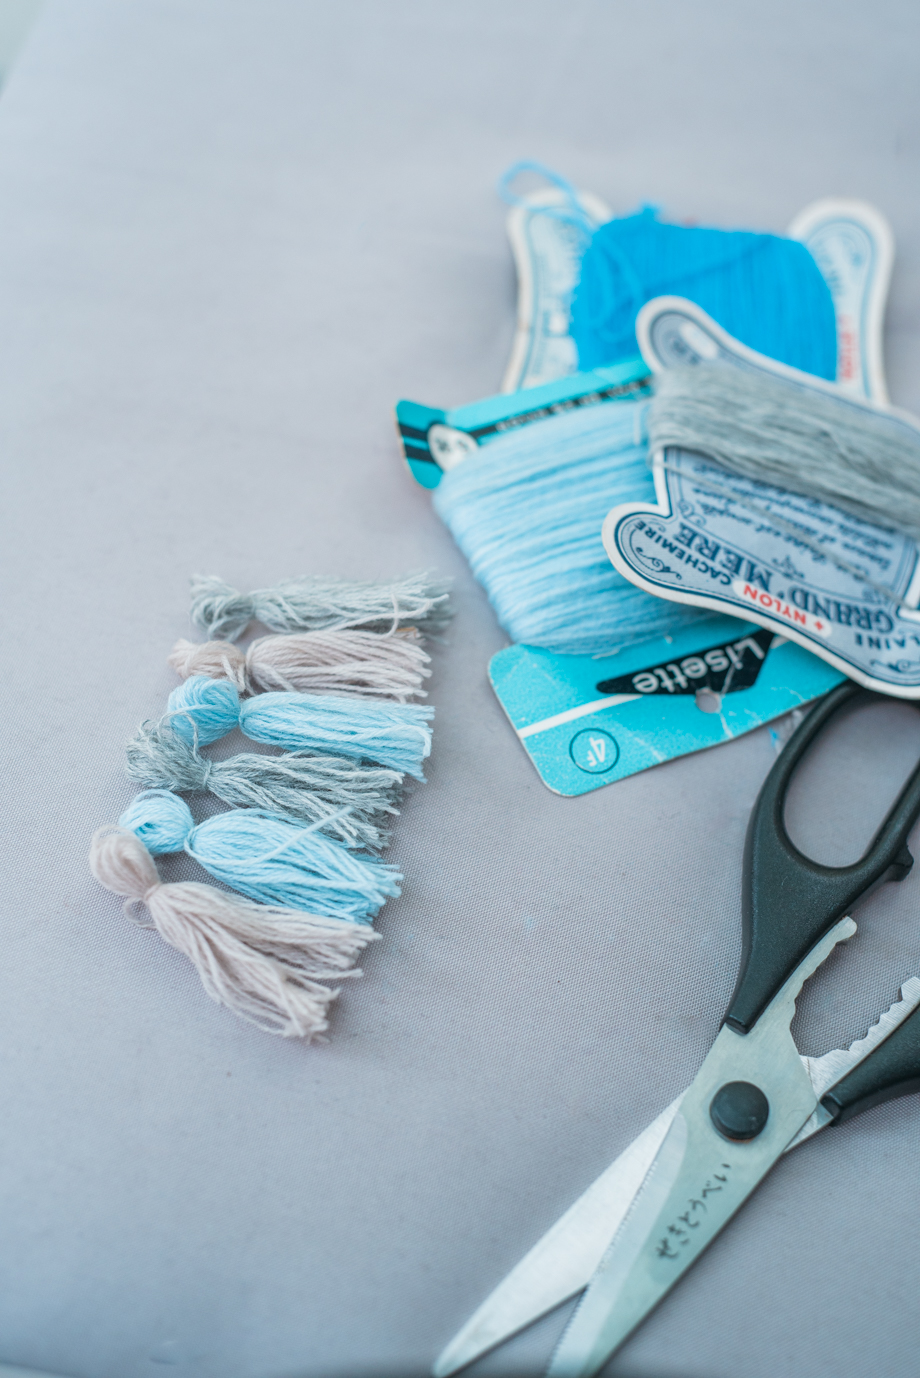 DIY-Make-your-own-tassels-lifestyleblog-anaisstoelen-9.jpg